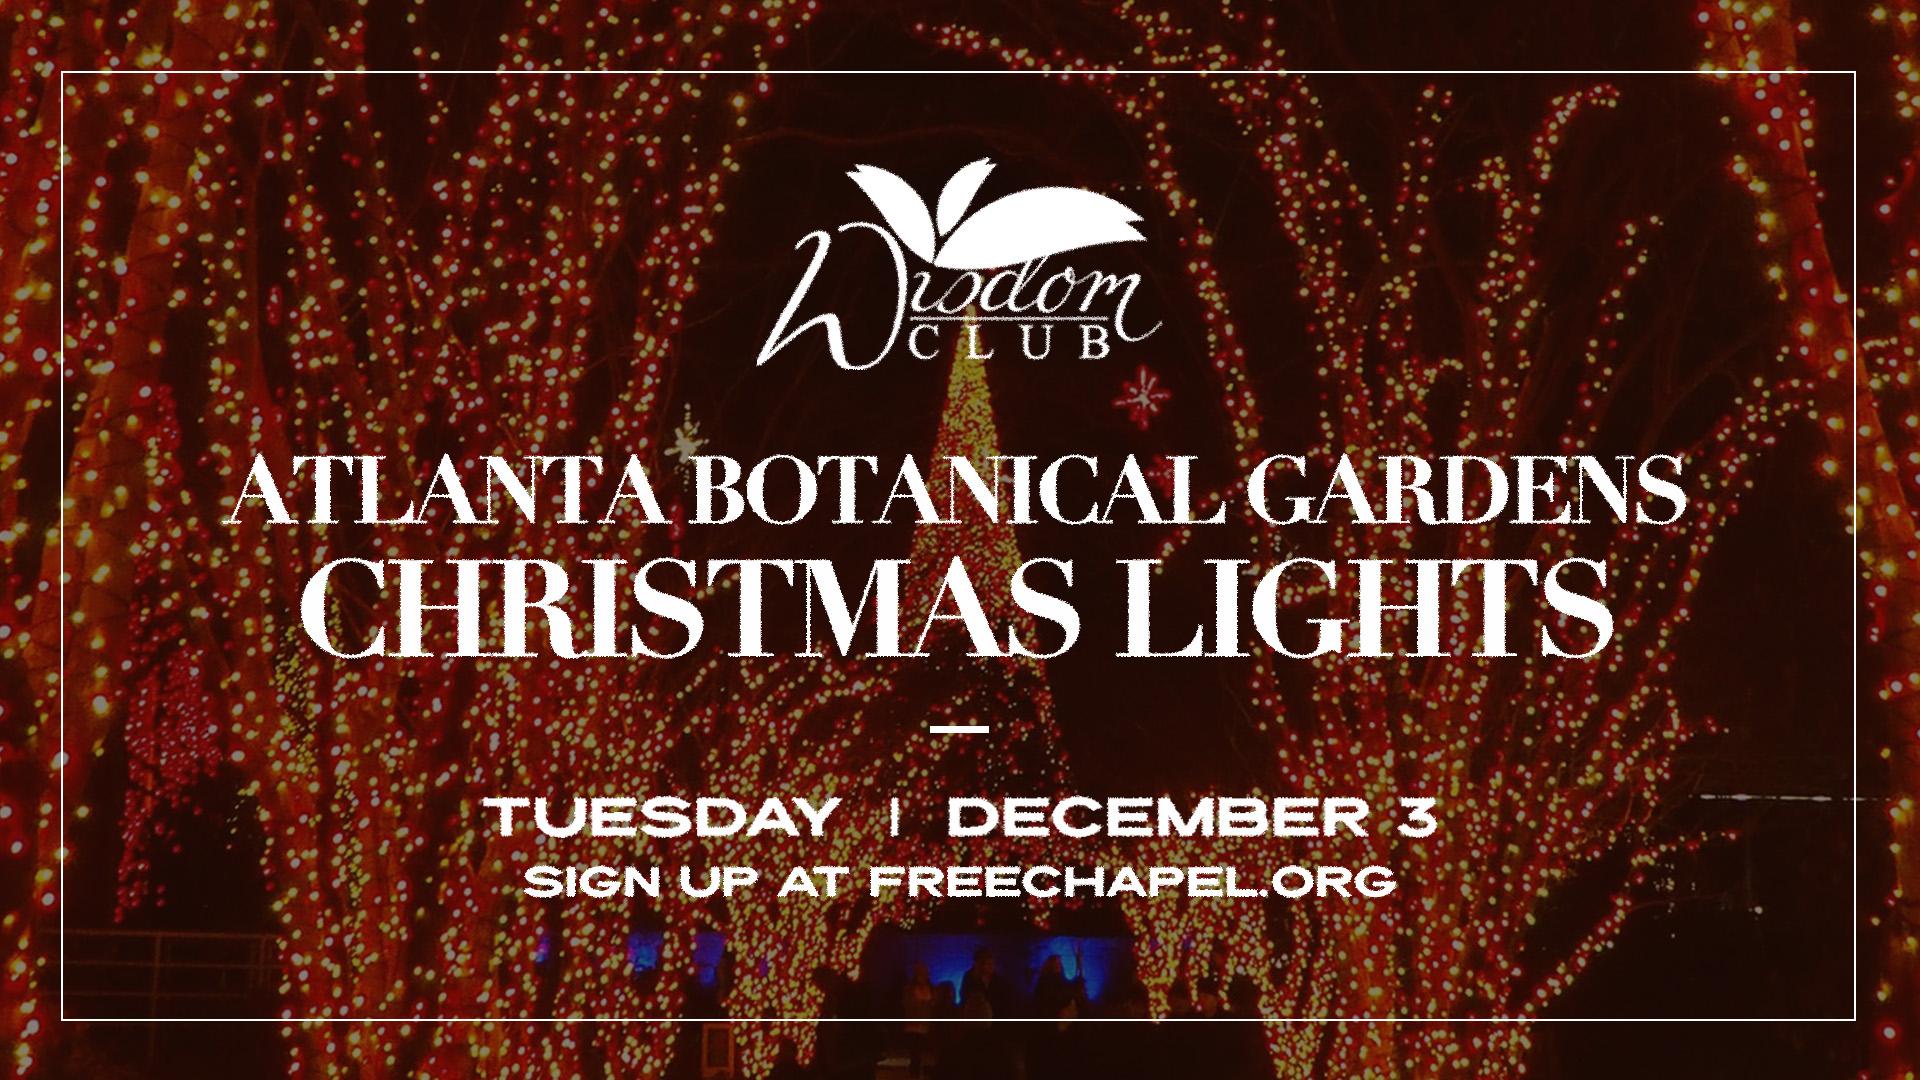 Wisdom Club Atlanta Botanical Gardens Christmas Lights at the Gainesville campus